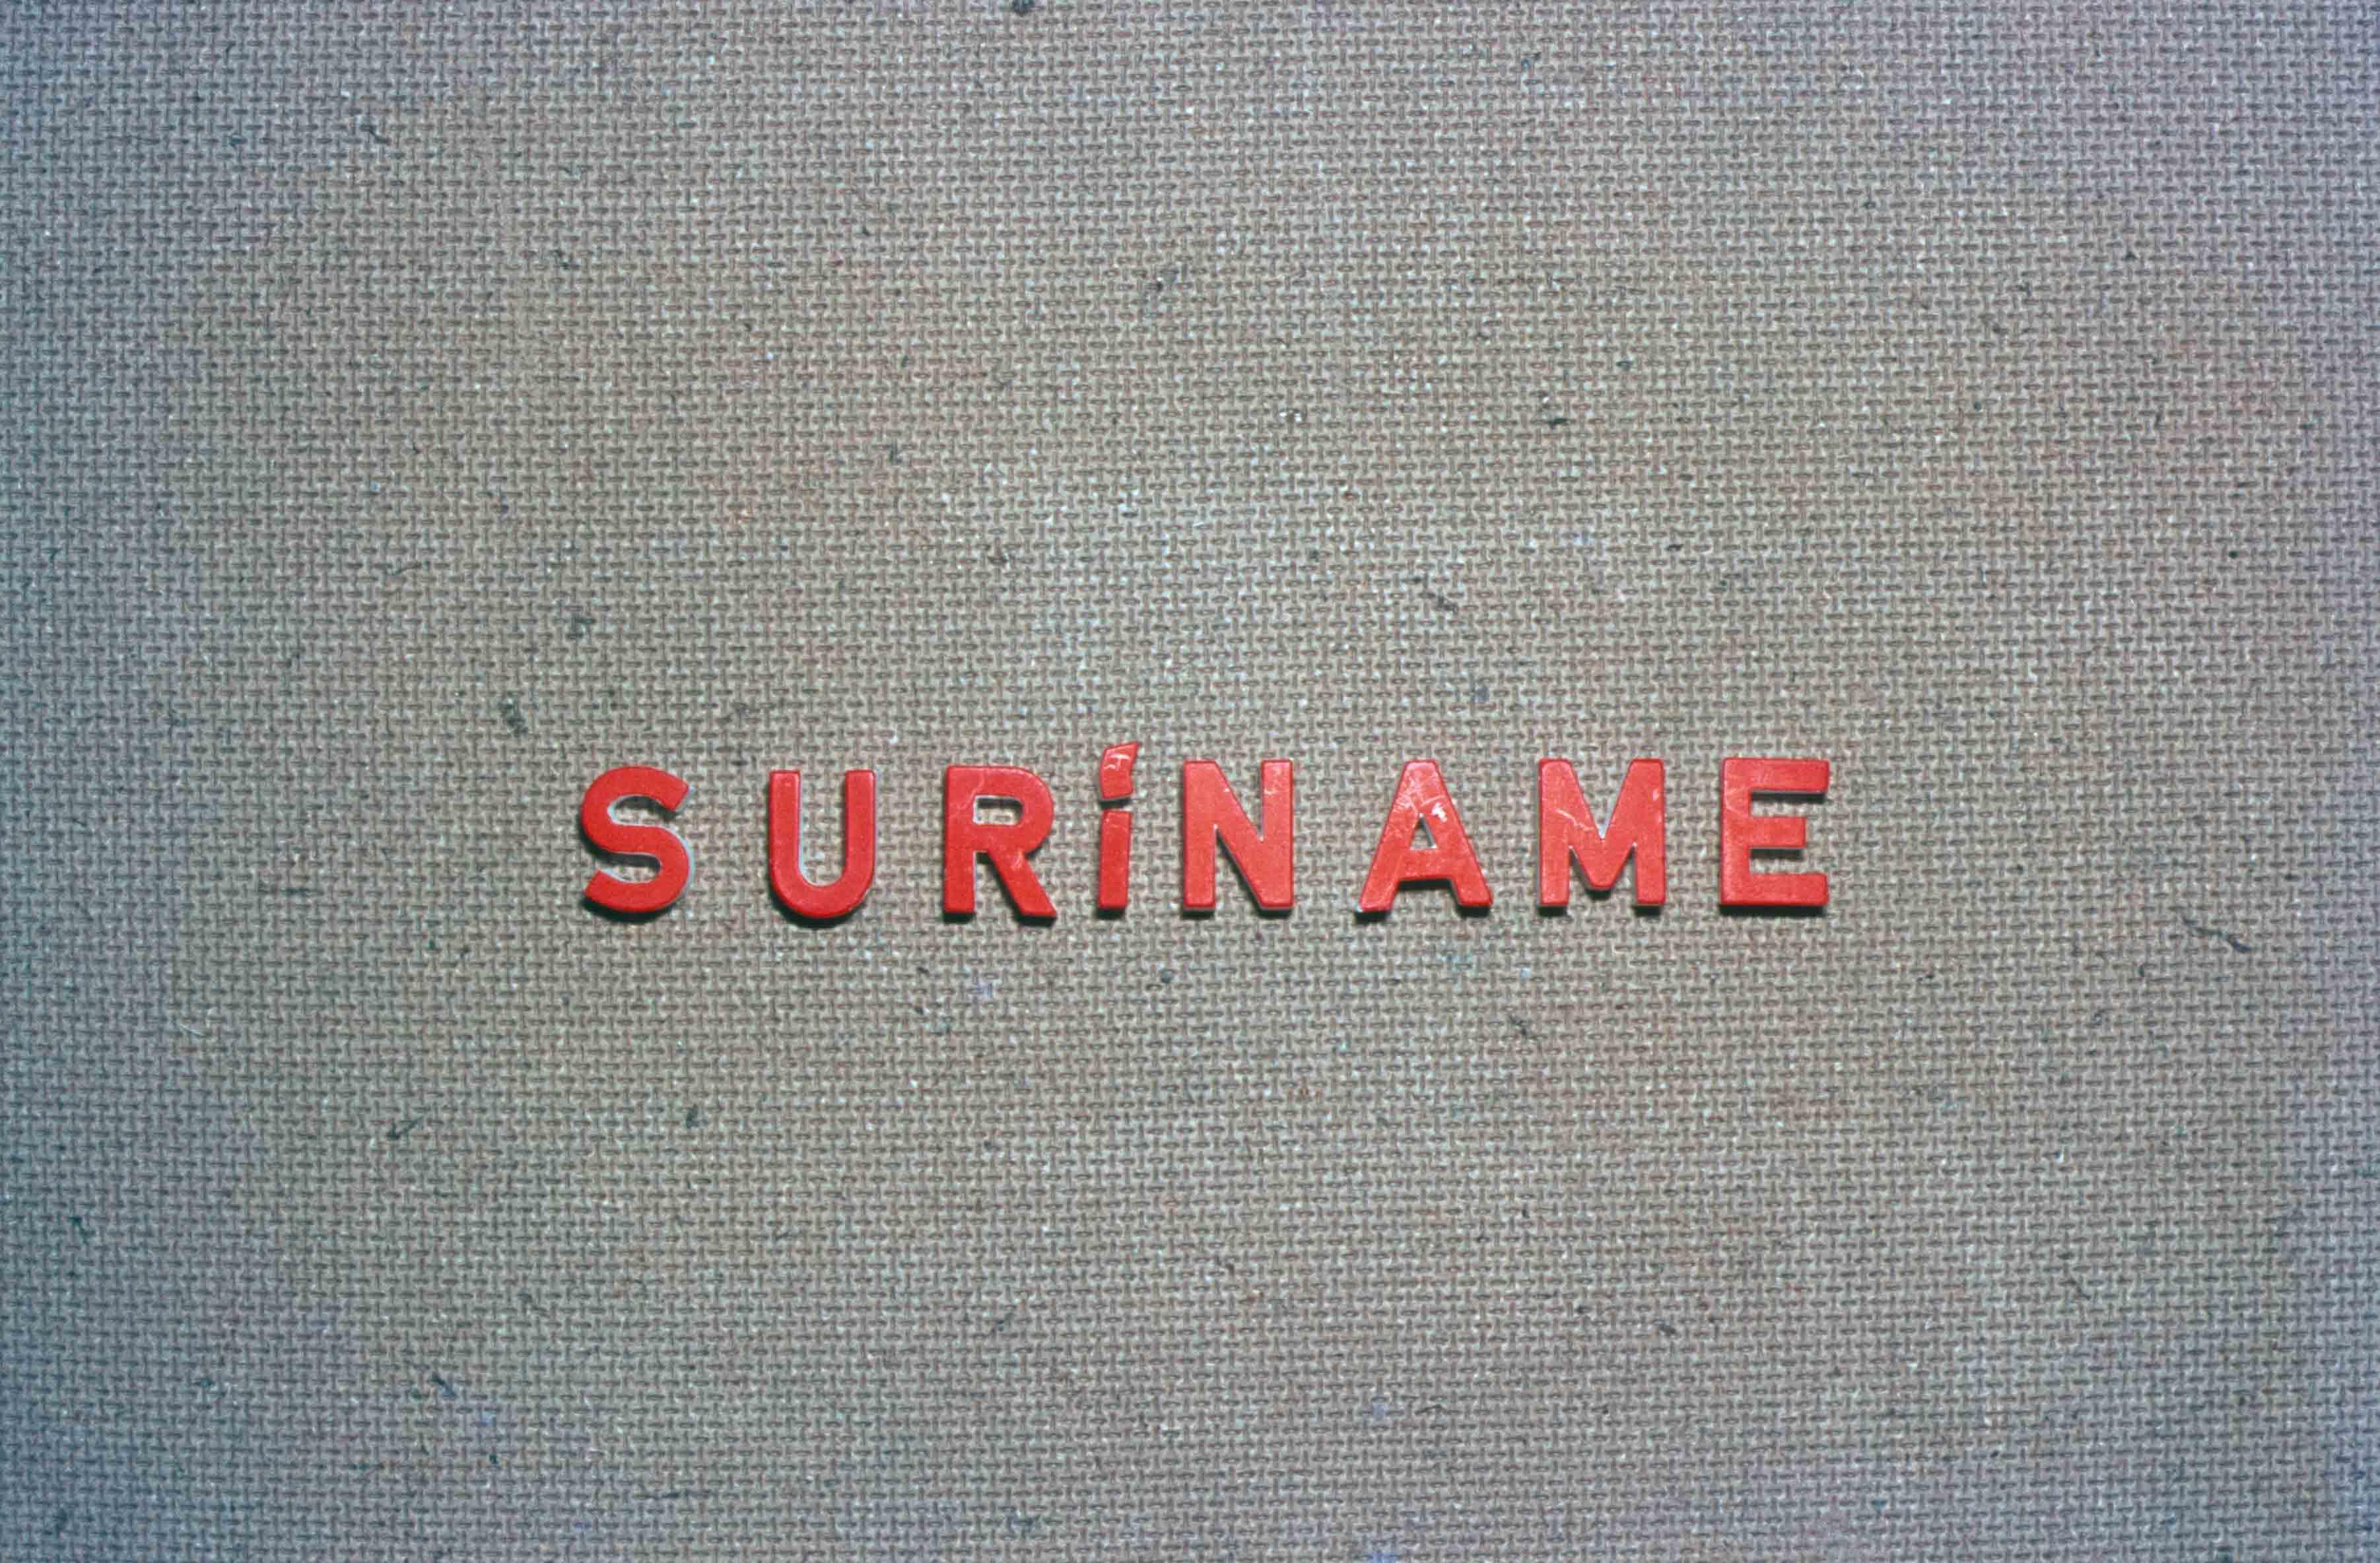 50. Suriname